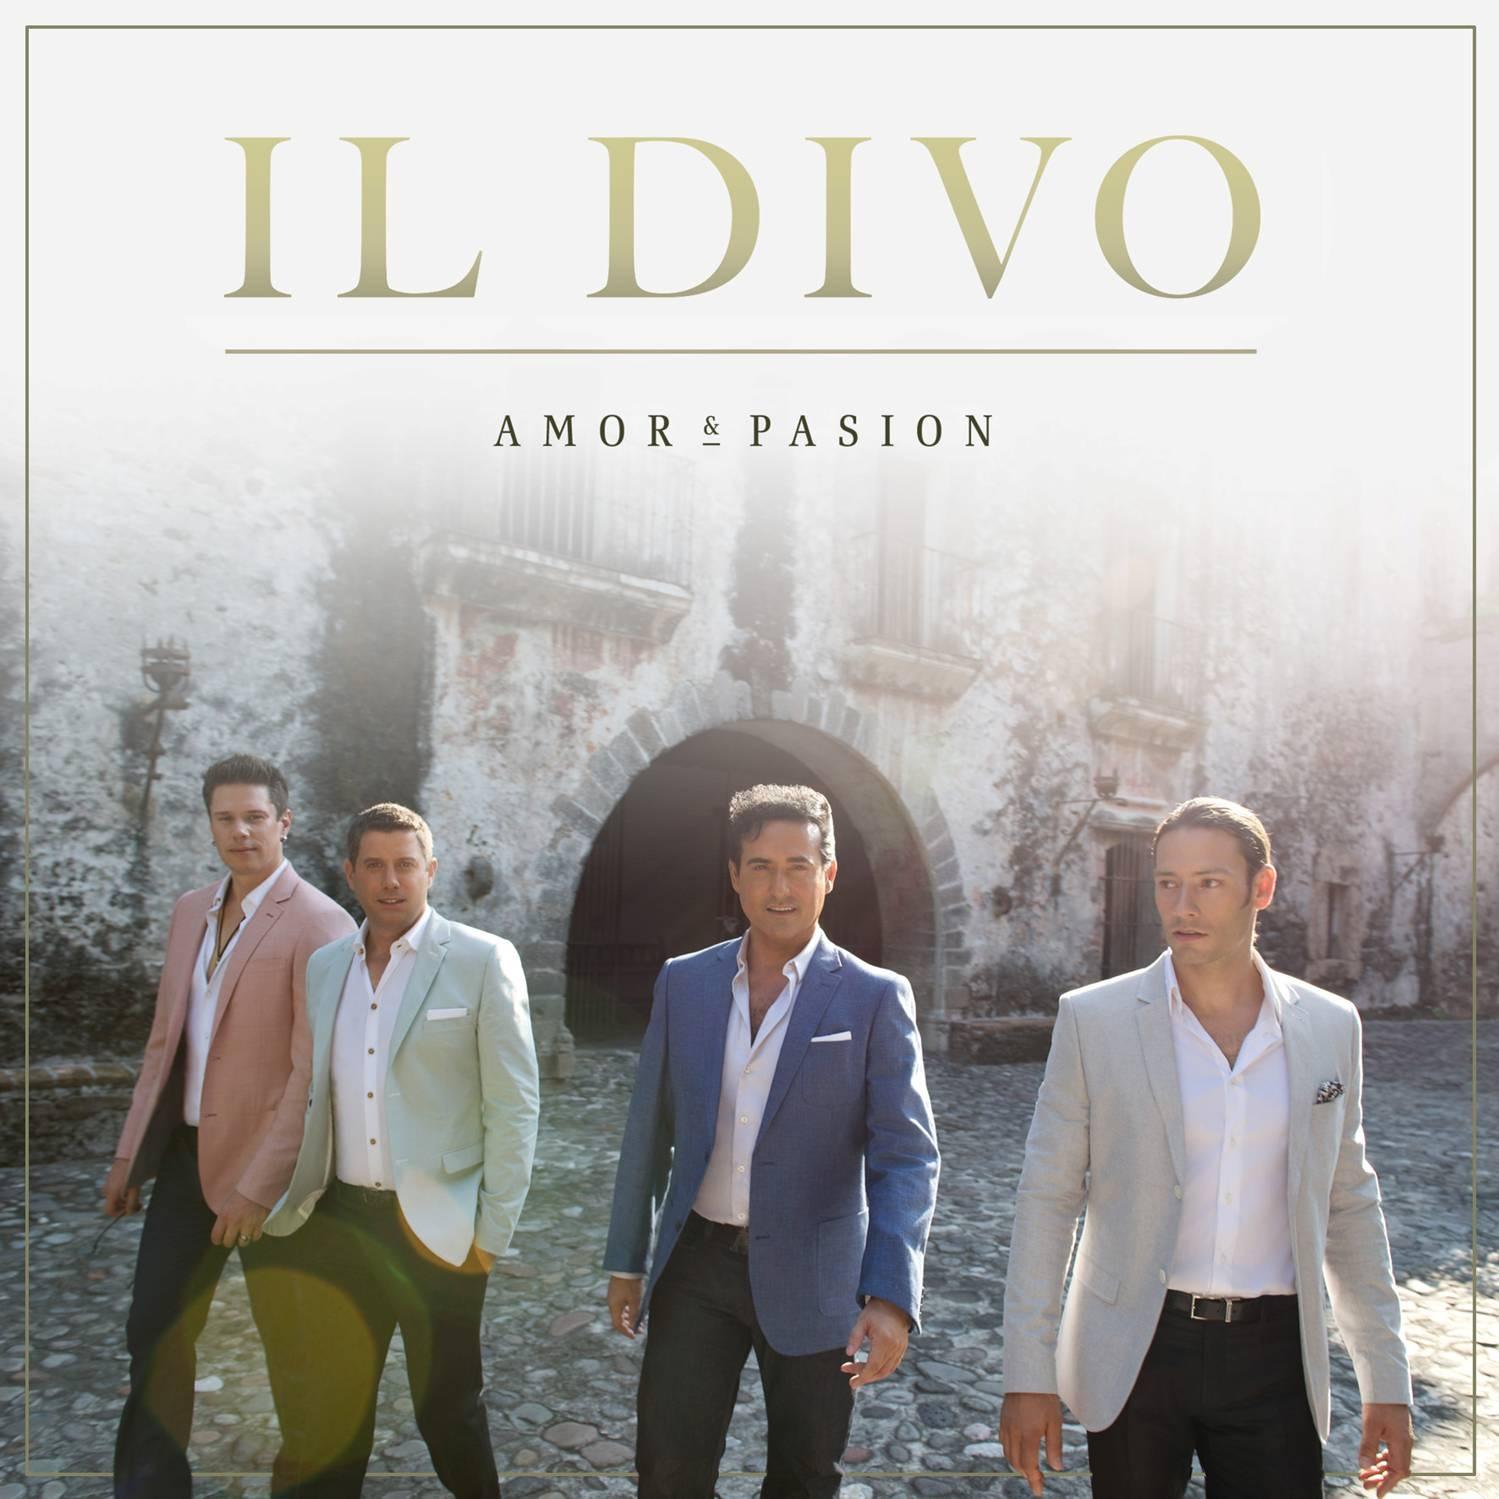 Il divo publican el 6 de noviembre su nuevo disco amor pasion sony music espa a - Il paolo regista de il divo ...